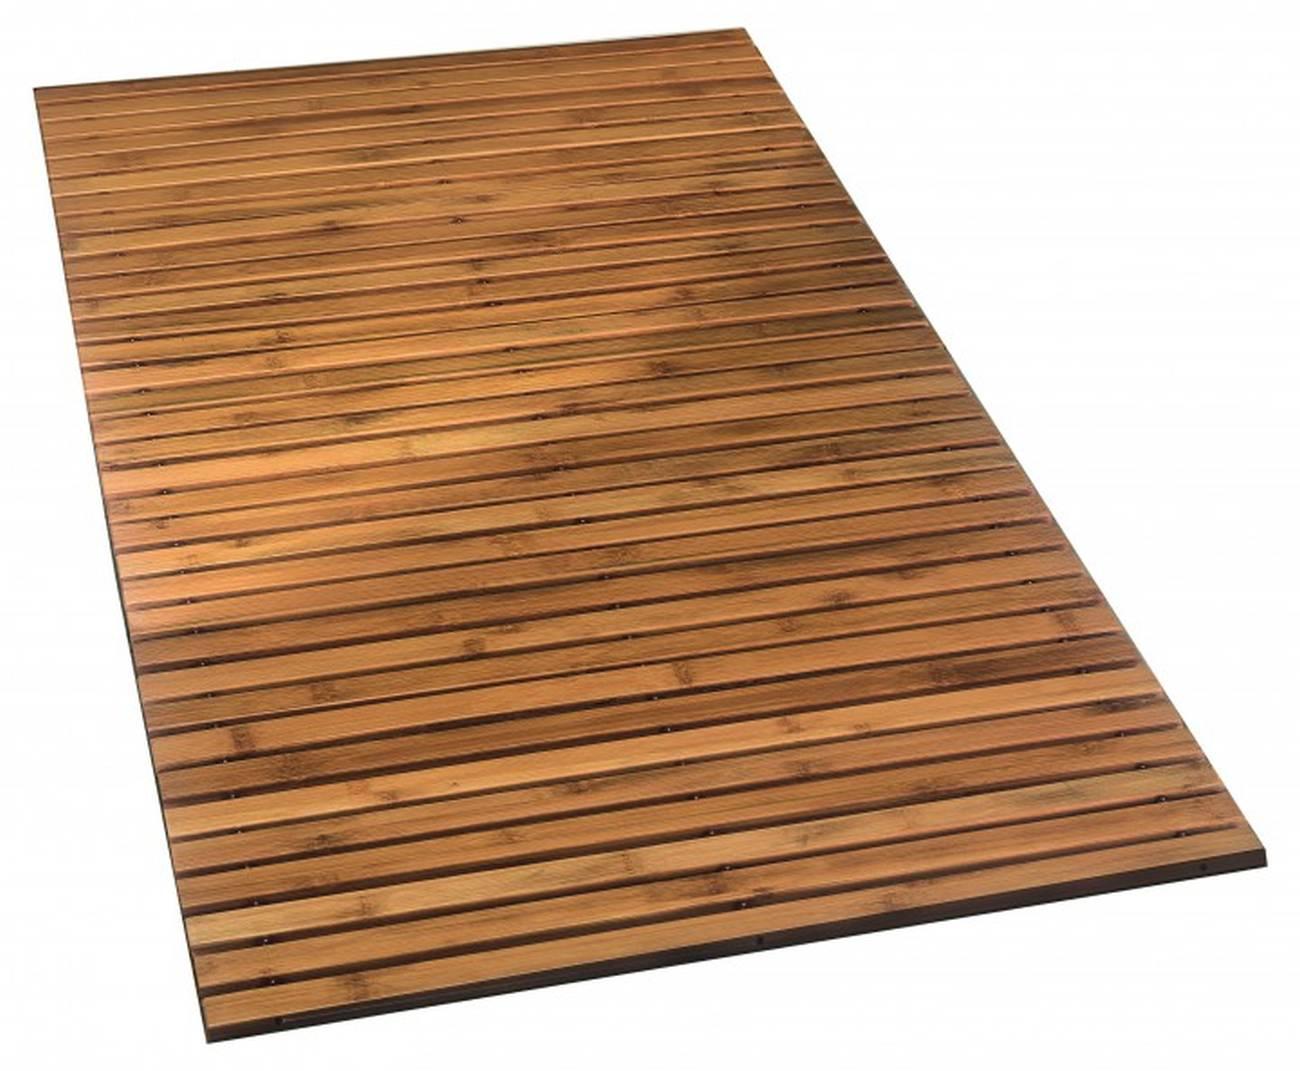 Holzmatte Level Bambus Natur 60x115 cm